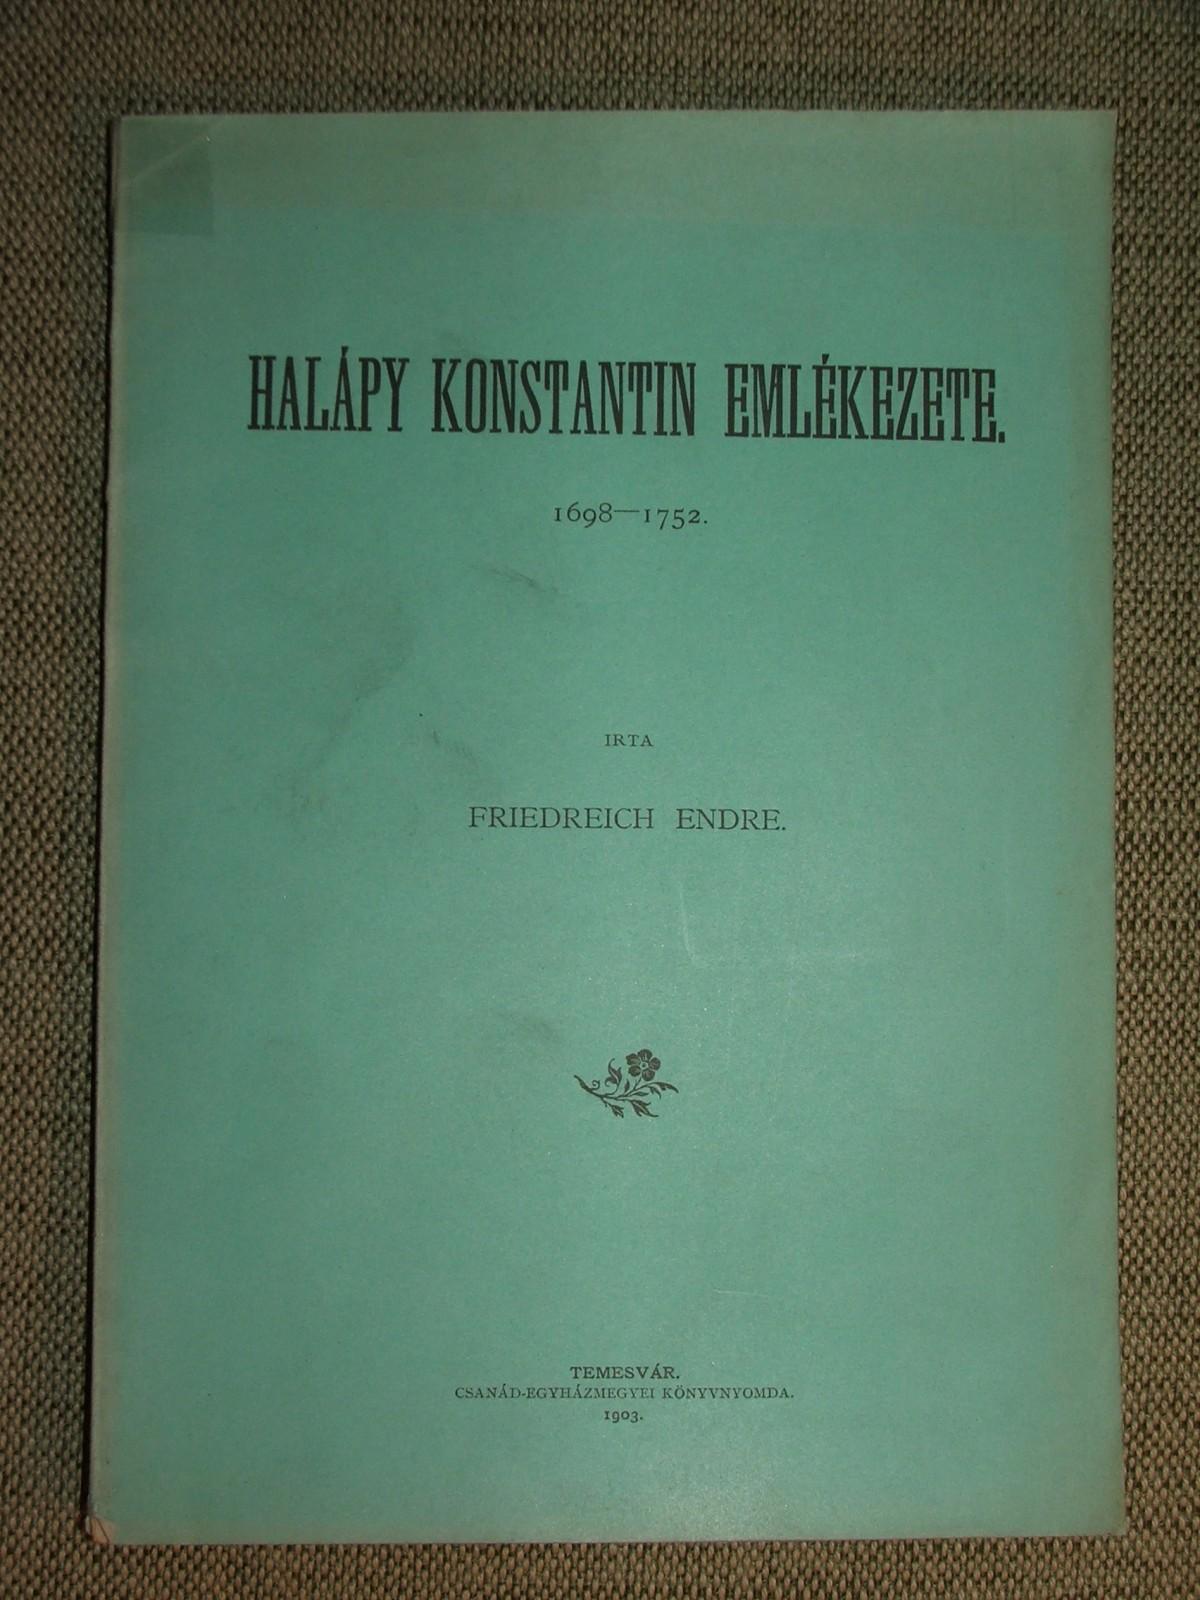 FRIEDREICH Endre: Halápy Konstantin emlékezete.